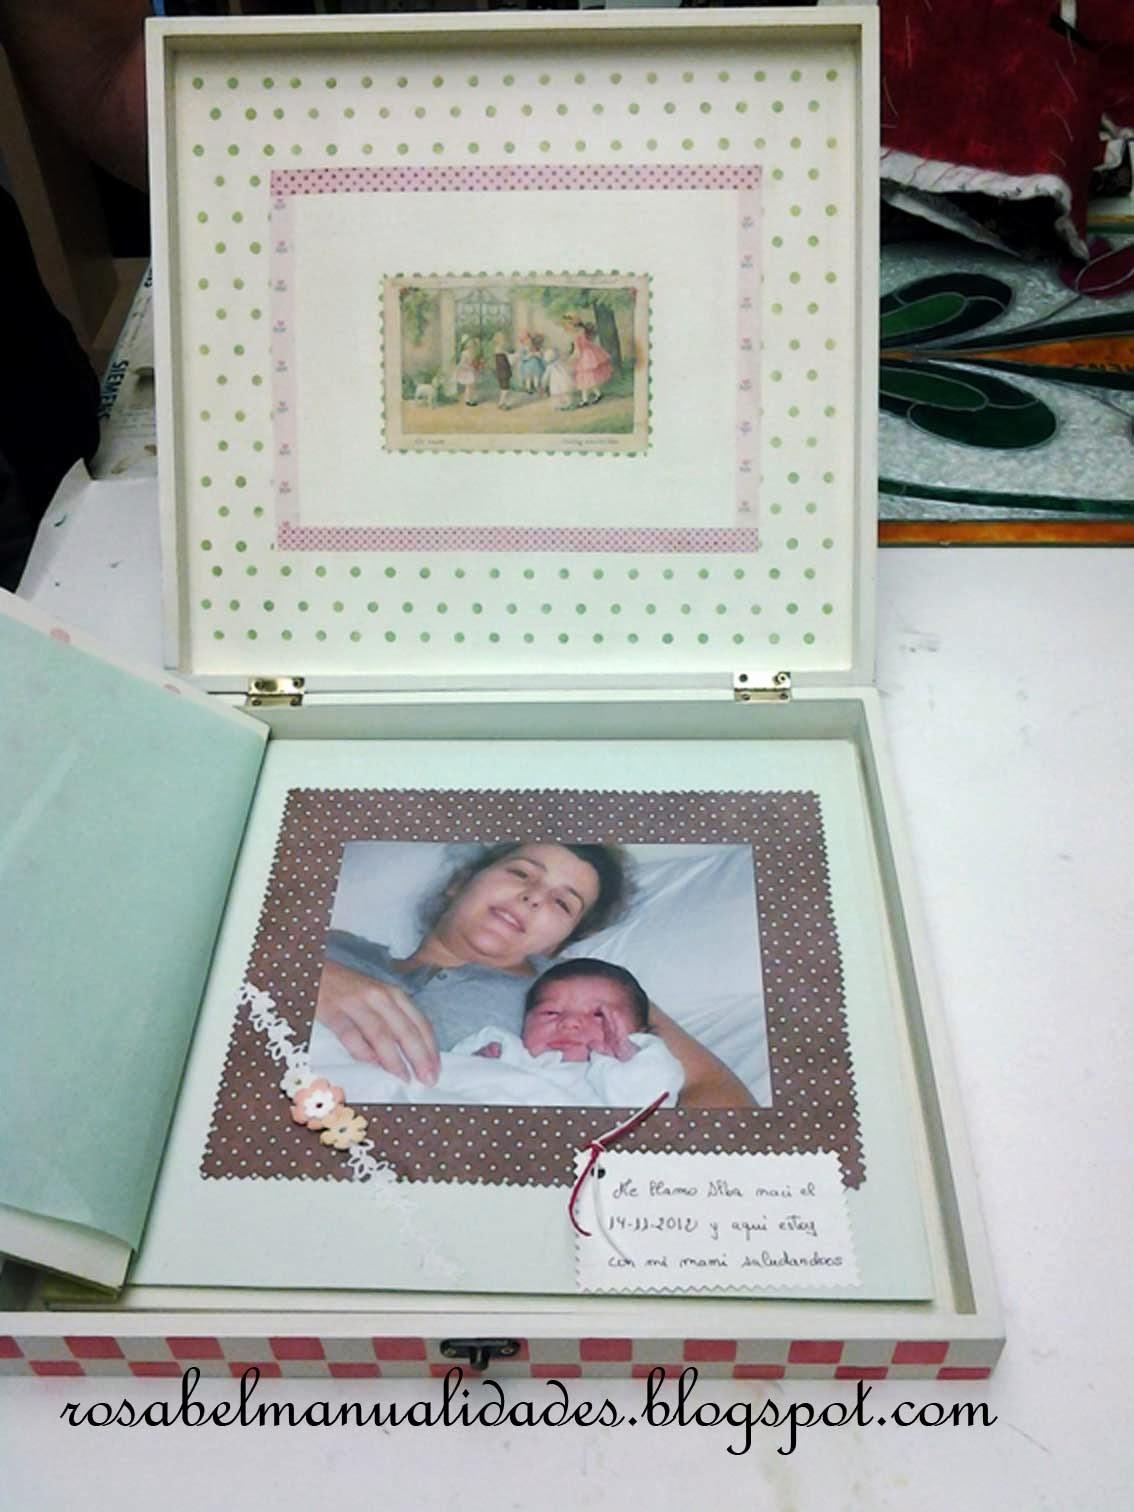 Rosabel manualidades album de fotos con caja - Manualidades album de fotos ...